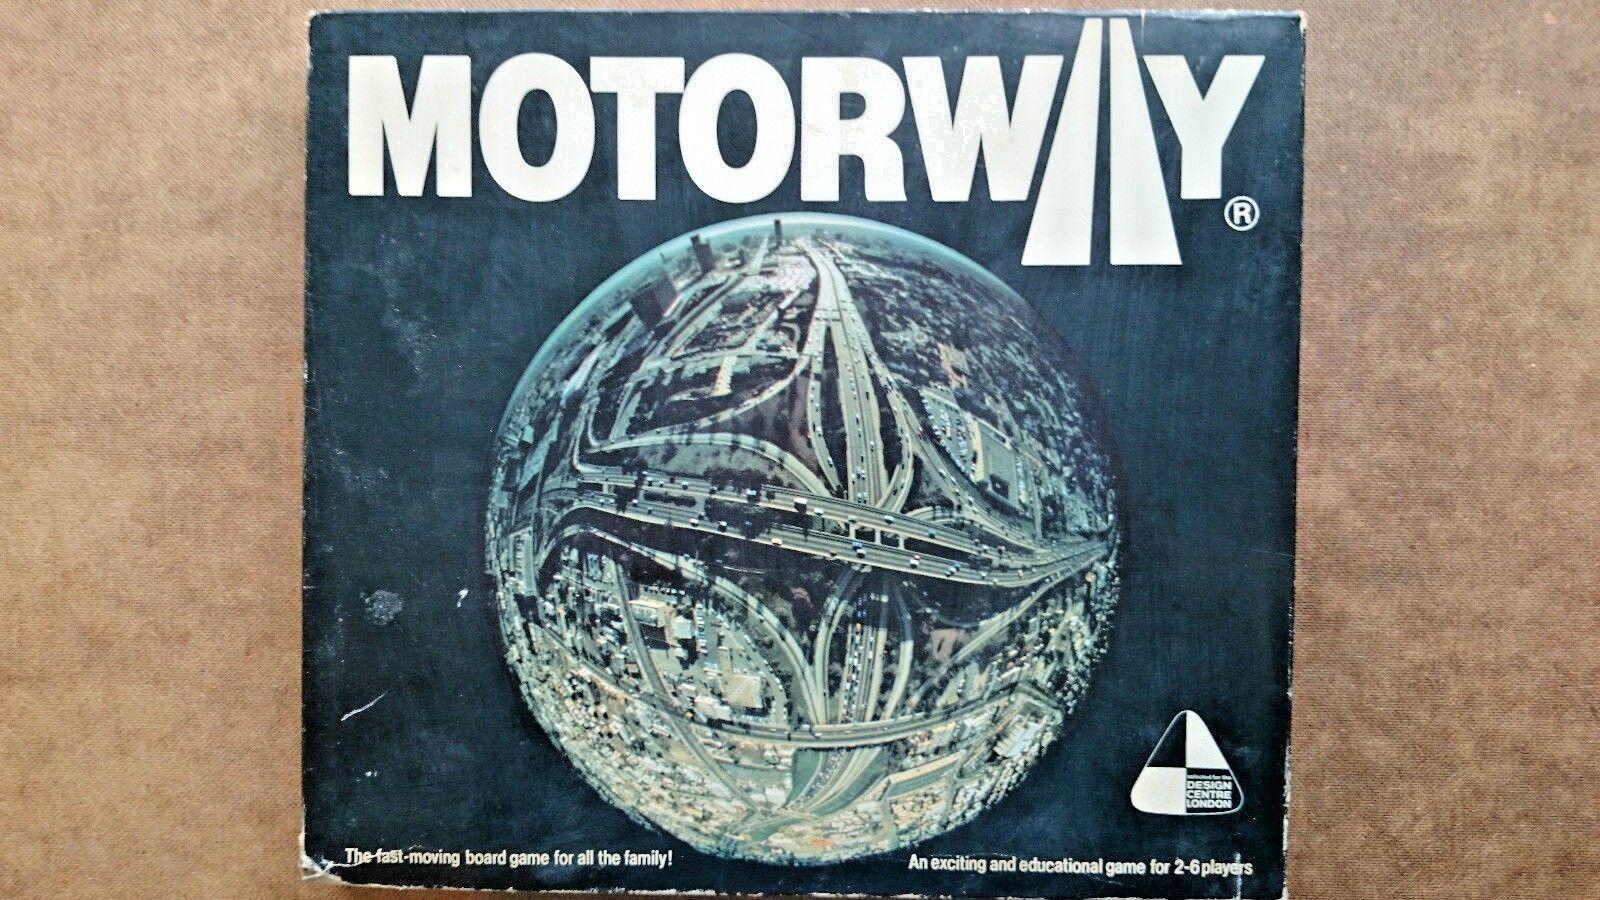 Motorway  by Campus Martius 1978